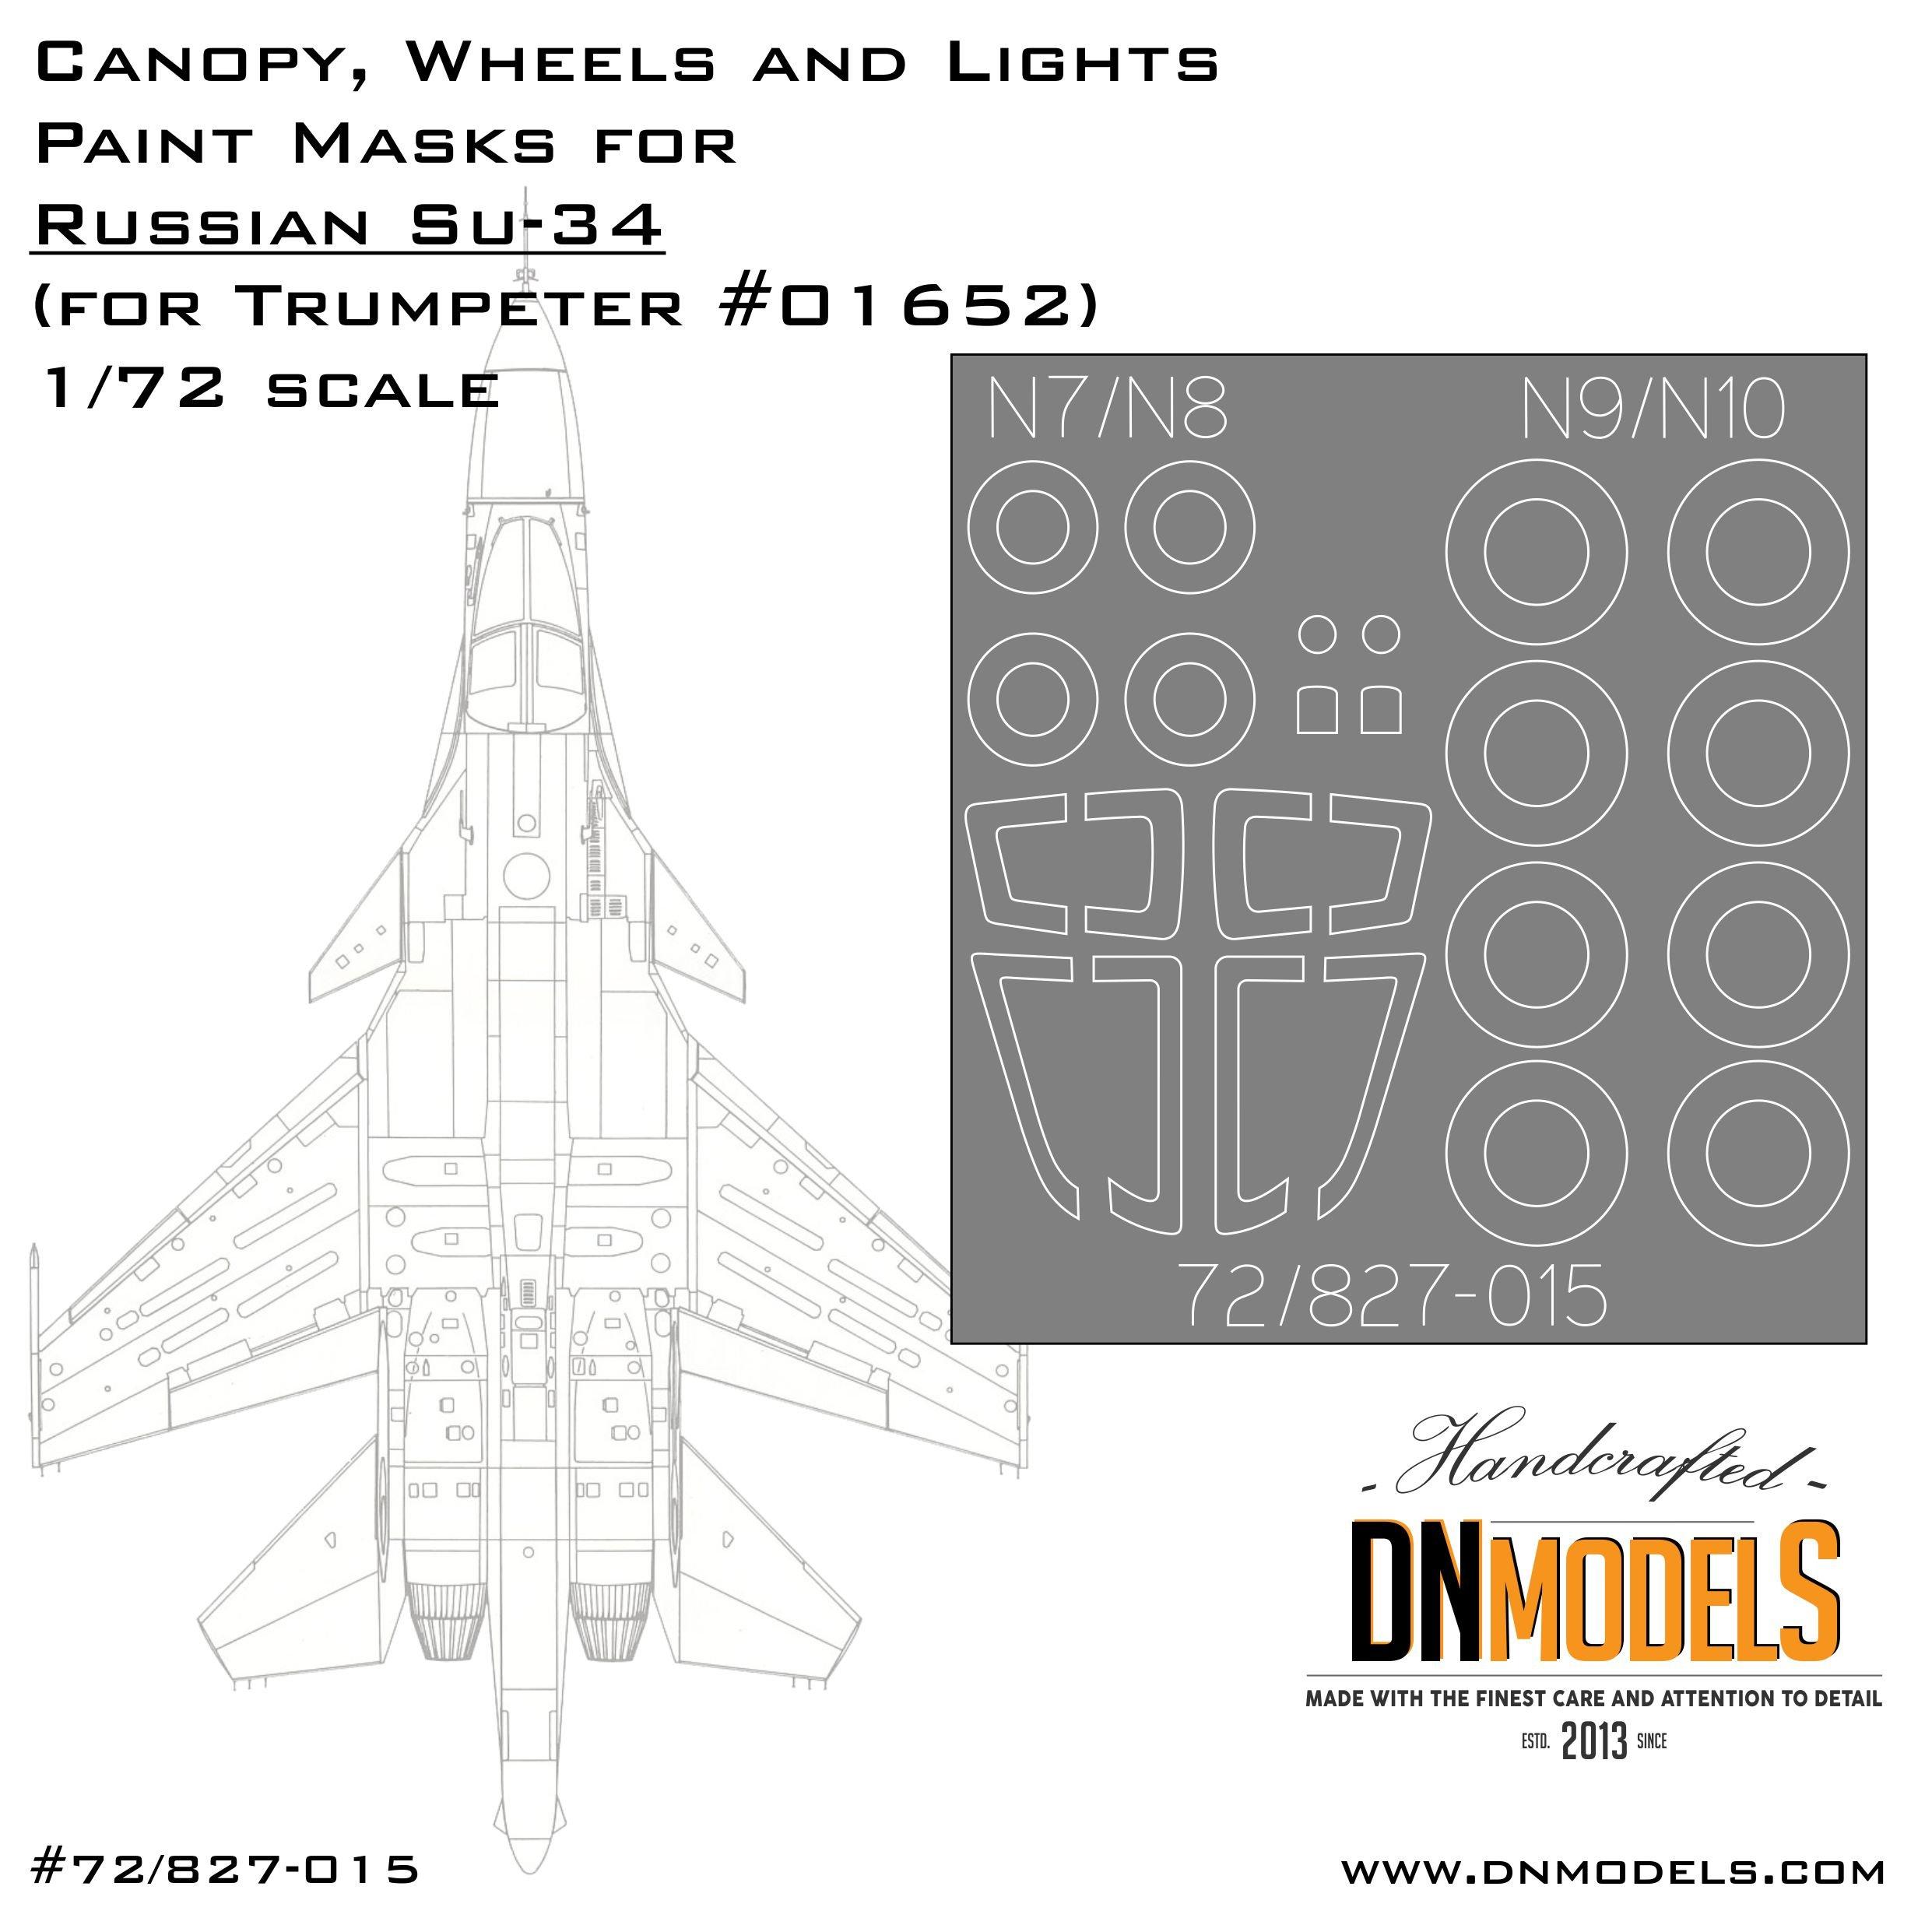 Cover Su-34 Canopy and Wheels 72th Canopy su-34 su-32fn fullback trumpeter italeri hobby boss hobbyboss zvezda